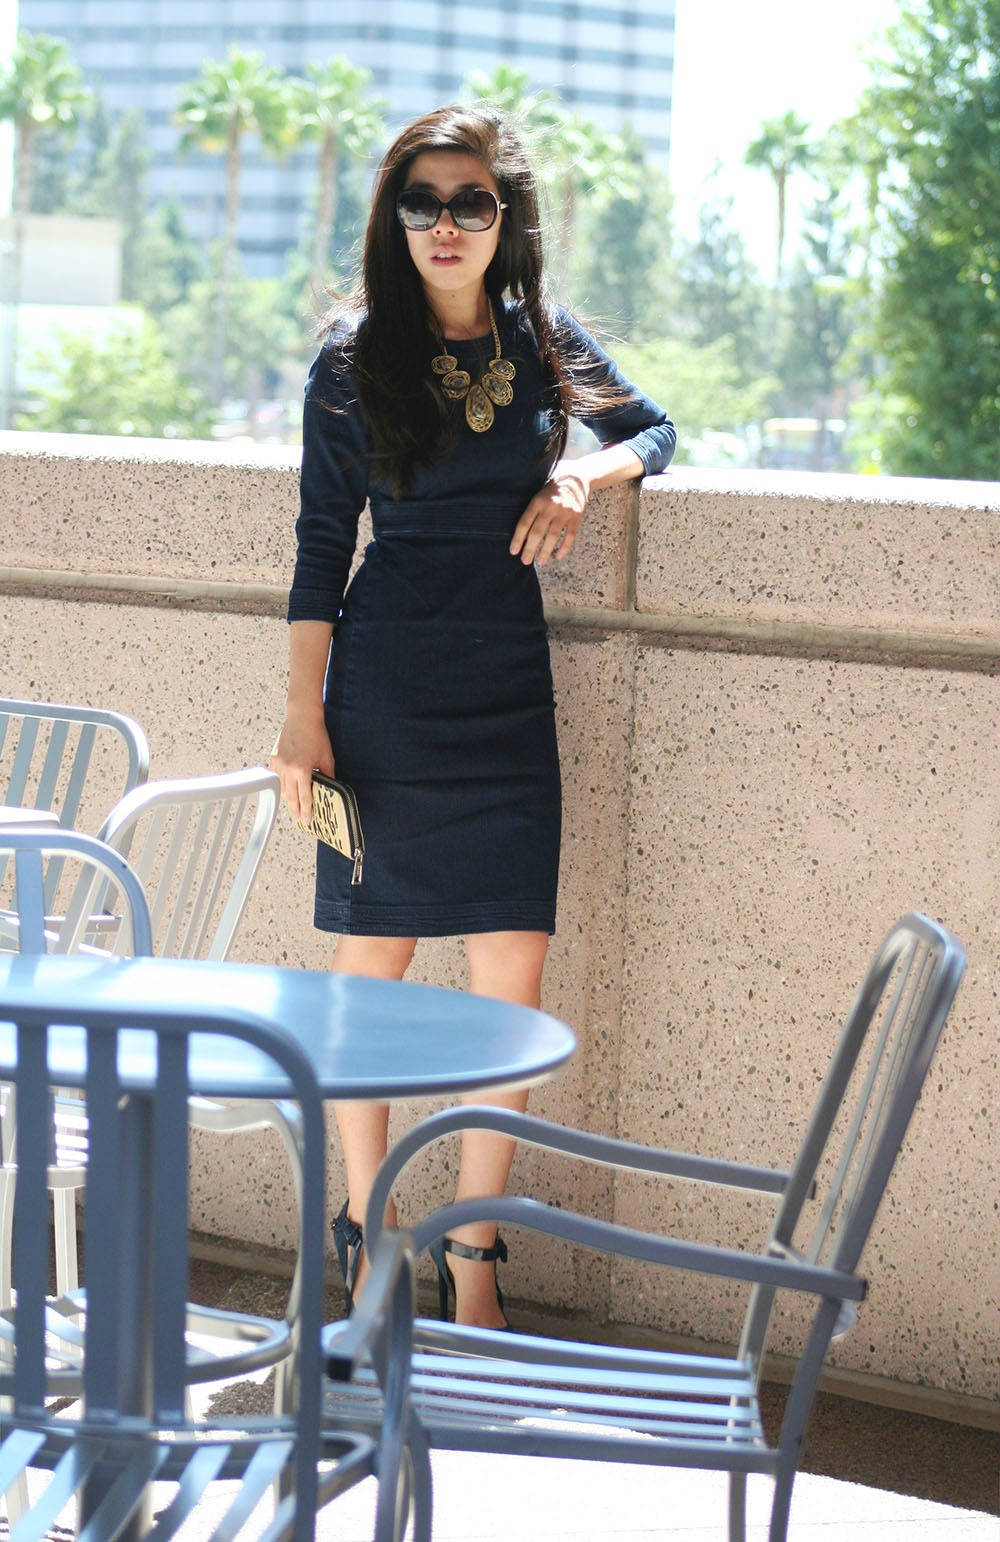 Adrienne Nguyen_Banana Republic Sponsored Post_Denim Bodycon Pencil Dress_What to Wear to Work)Work Wear Ideas_Petite Fashion